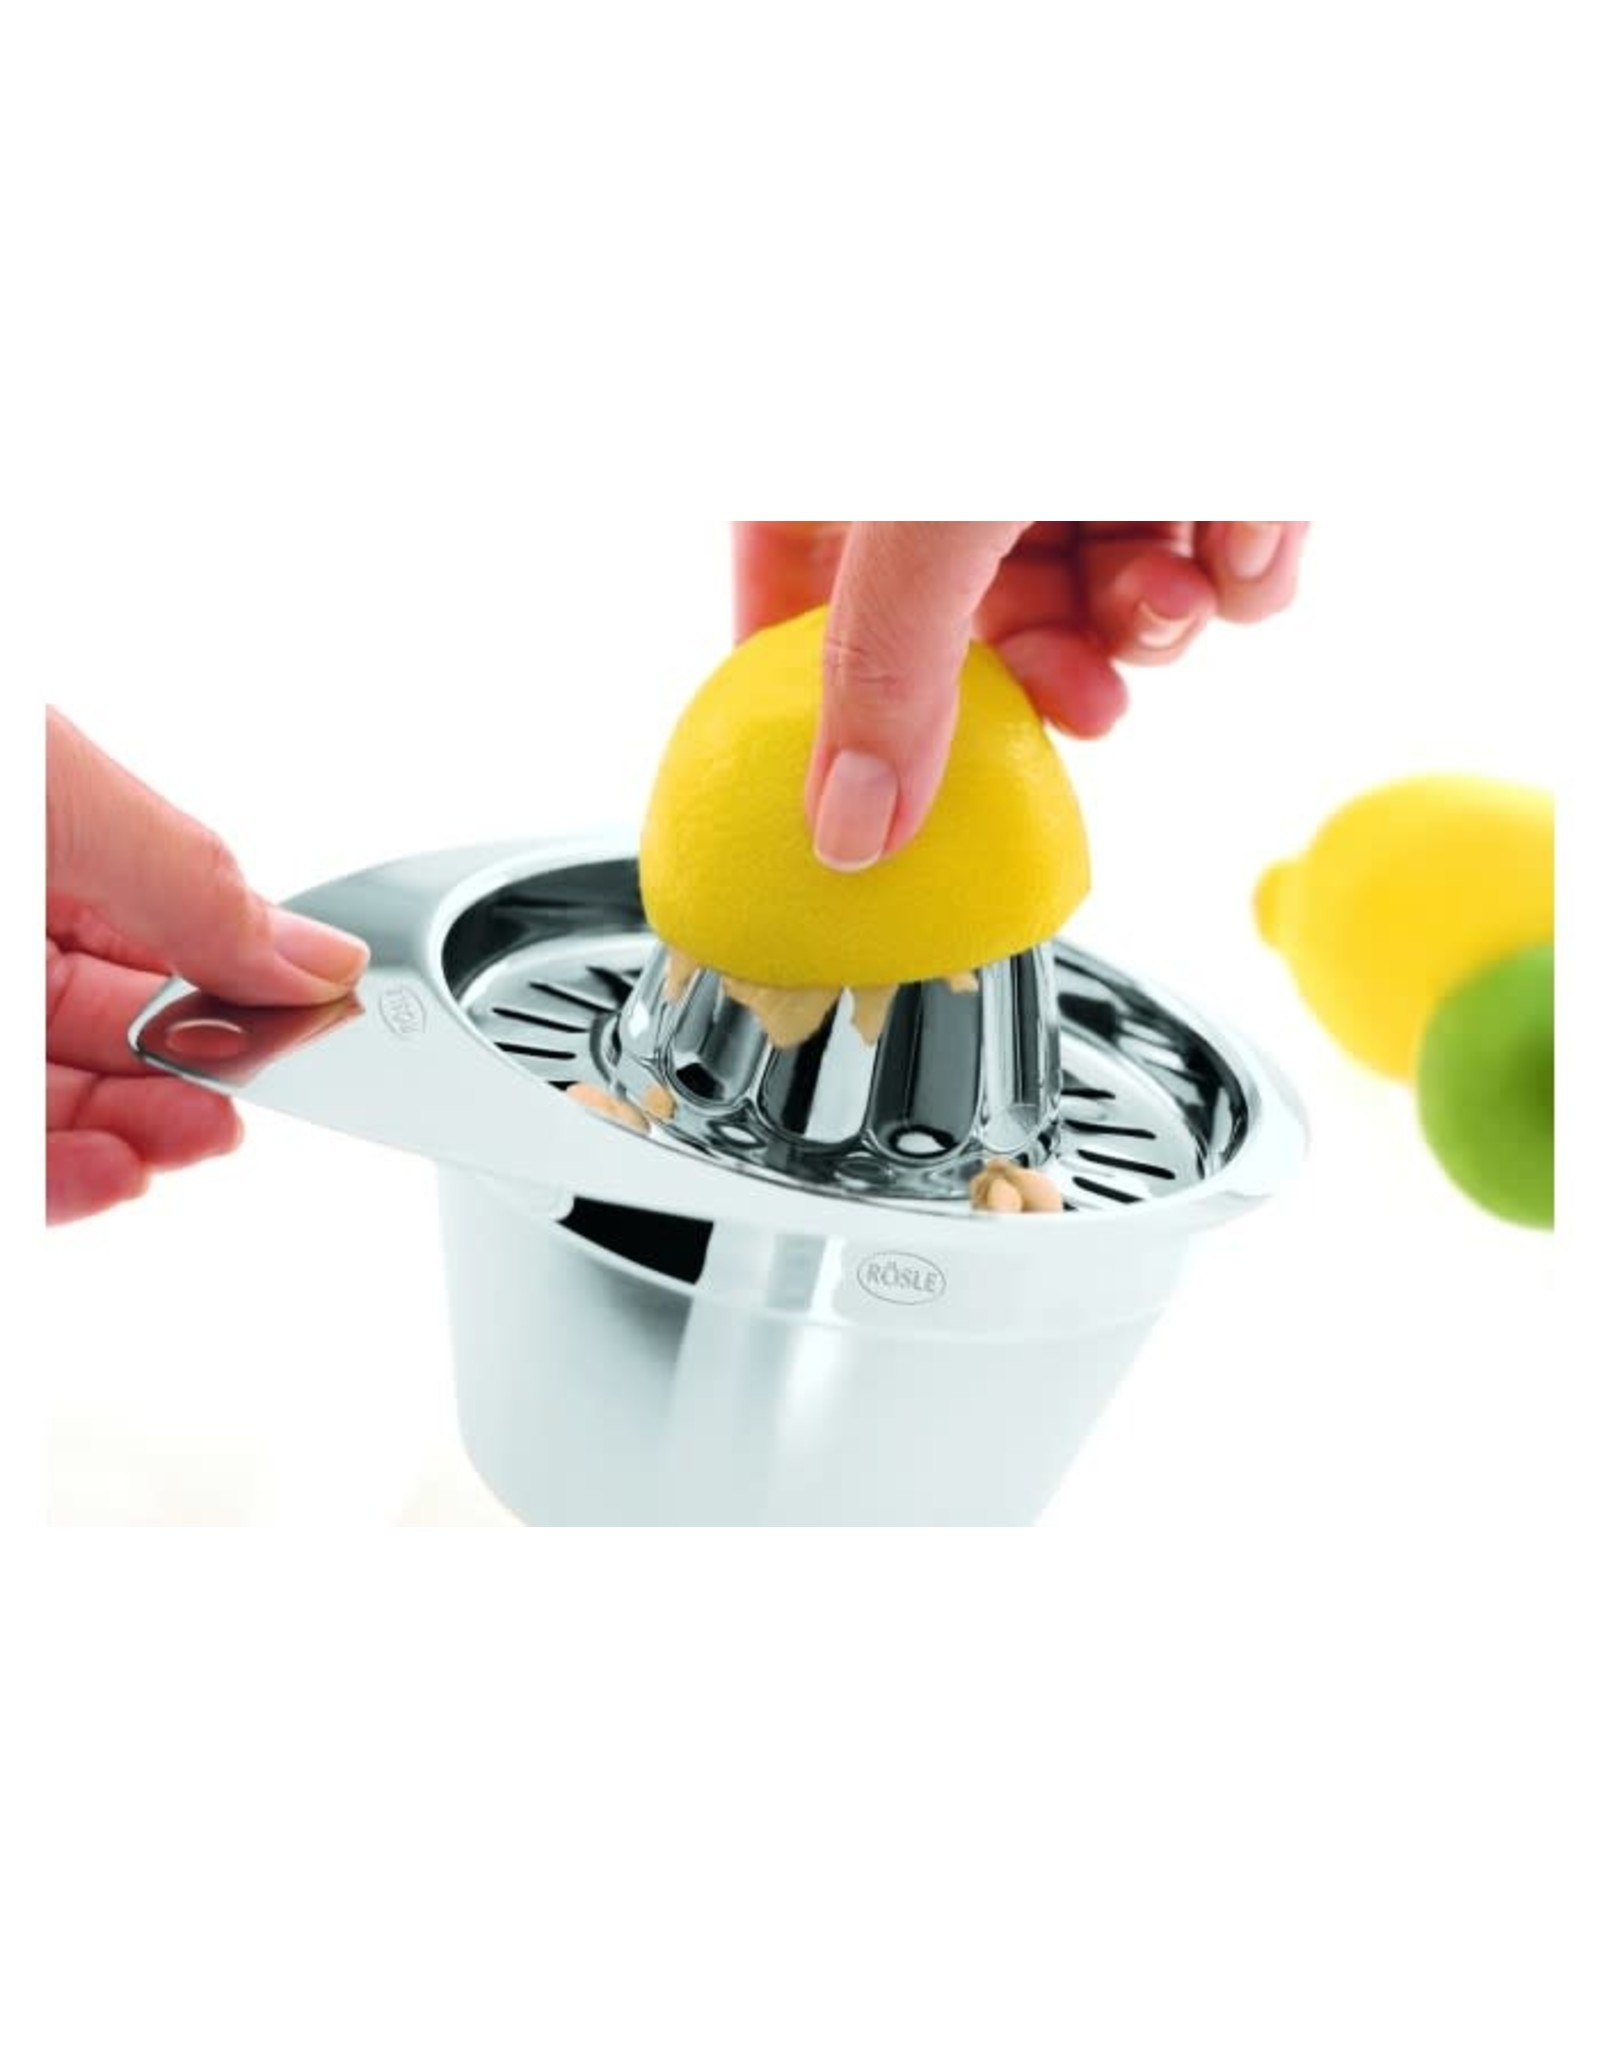 Rosle Lemon / Citrus Press ROSLE